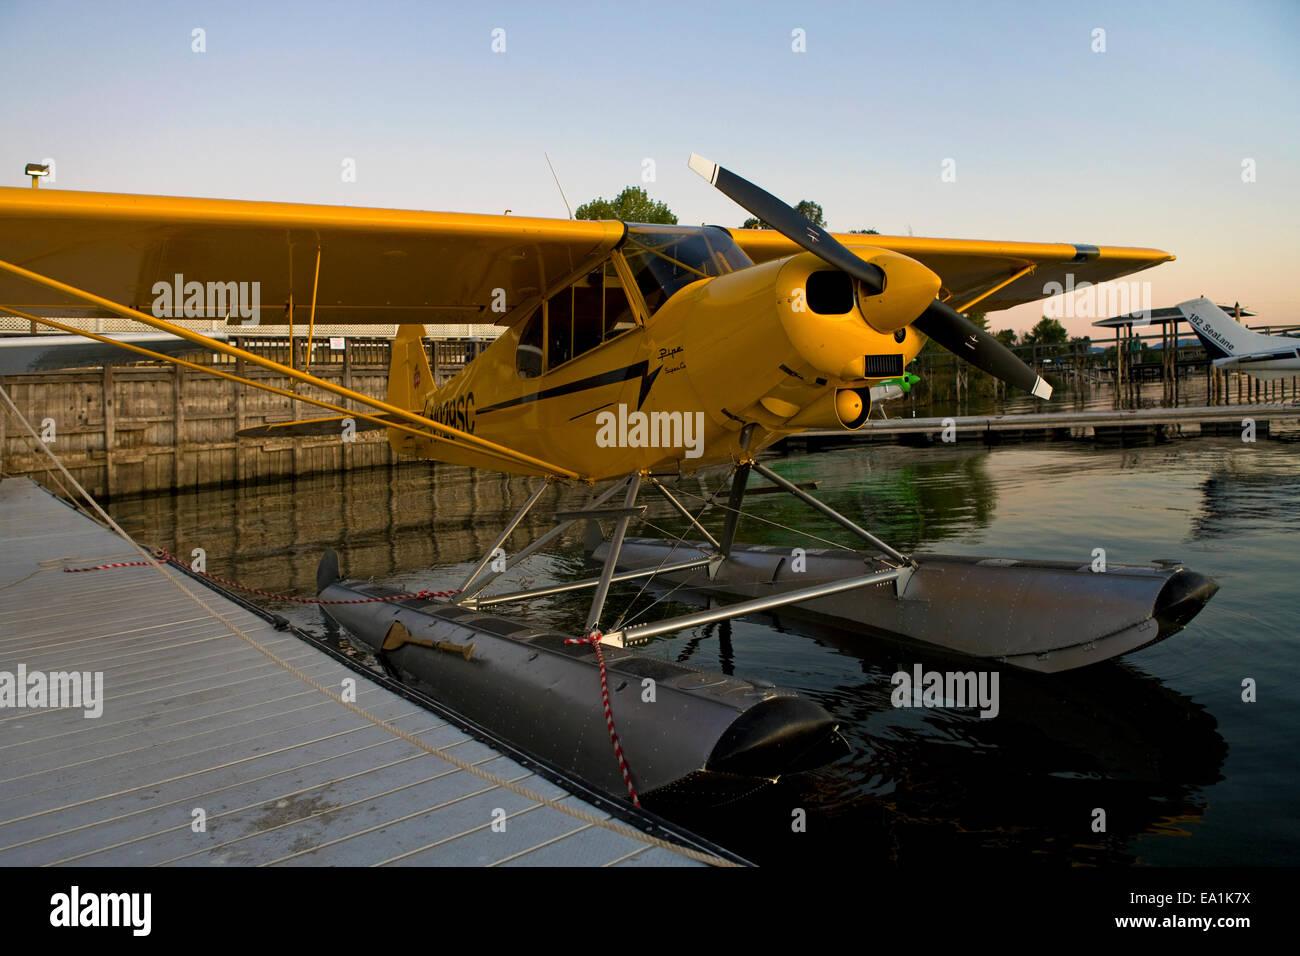 Piper Super Cub on Floats docked at the Sky Lark Motel dock, Seaplane Splash-In, Lakeport, California, Lake County, - Stock Image